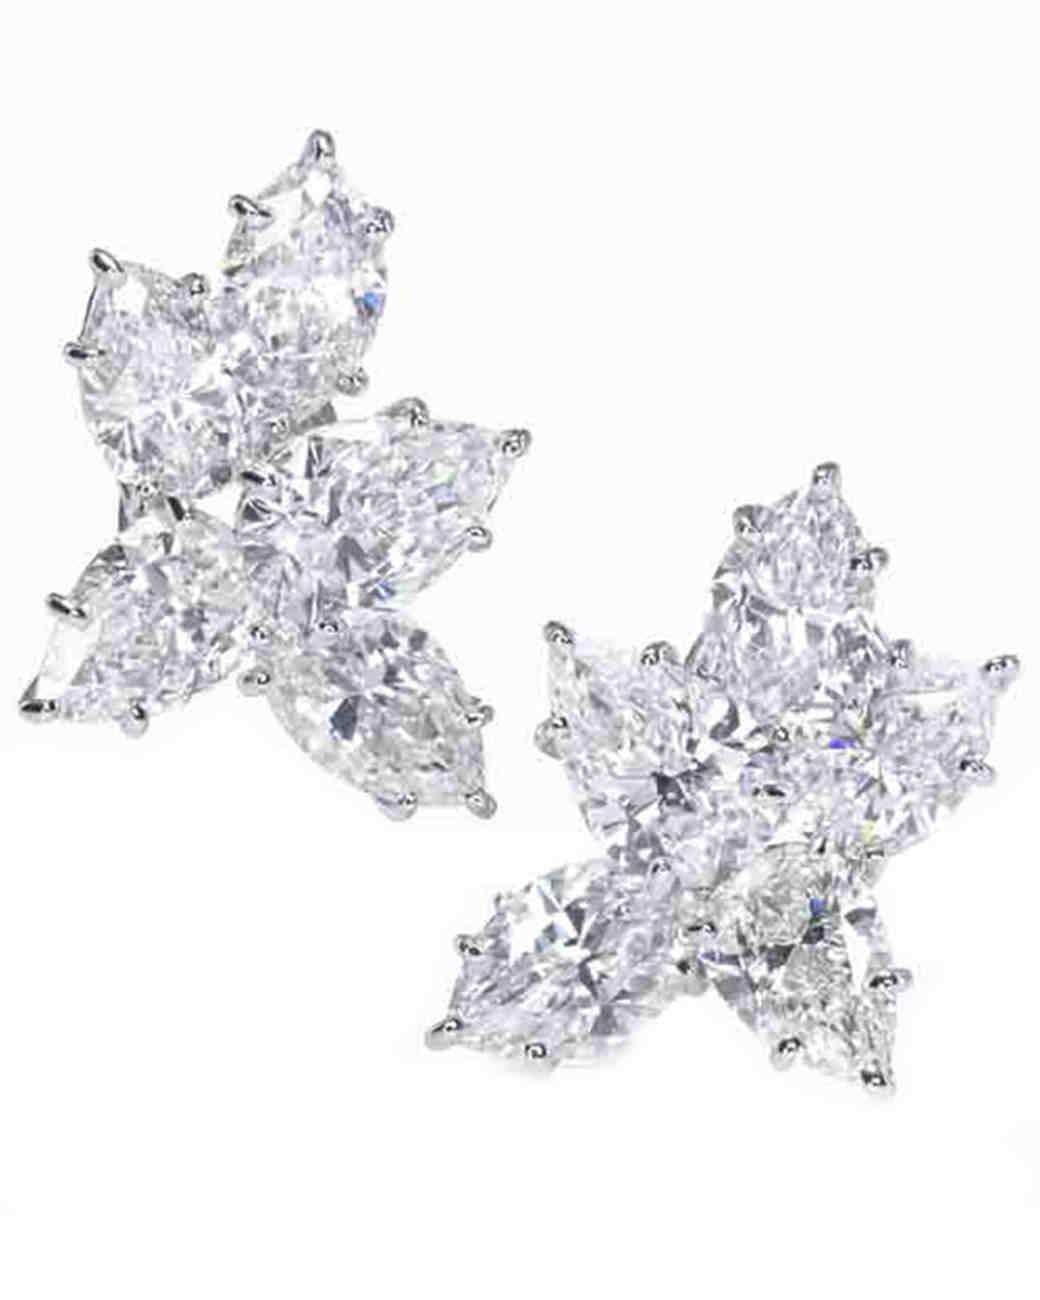 winston_103613_winston_diamond_cluster_earrings_1.jpg